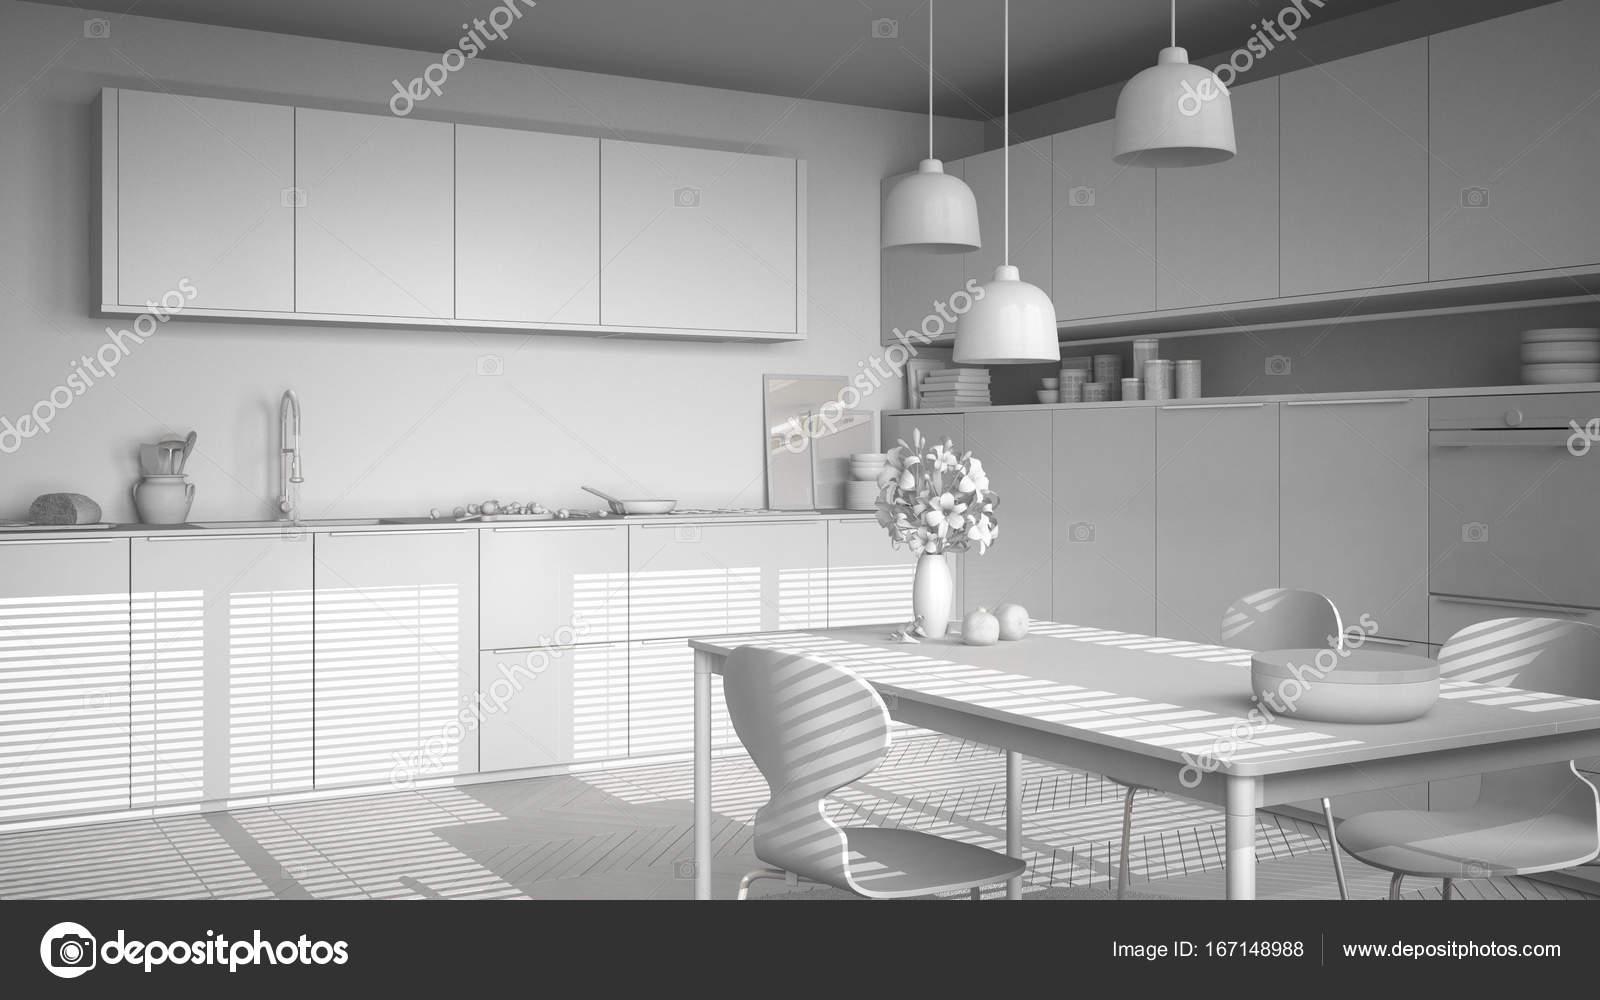 chairs for kitchen table sink drain size 白项目总的现代厨房 桌子和椅子 她 图库照片 c archiviz 167148988